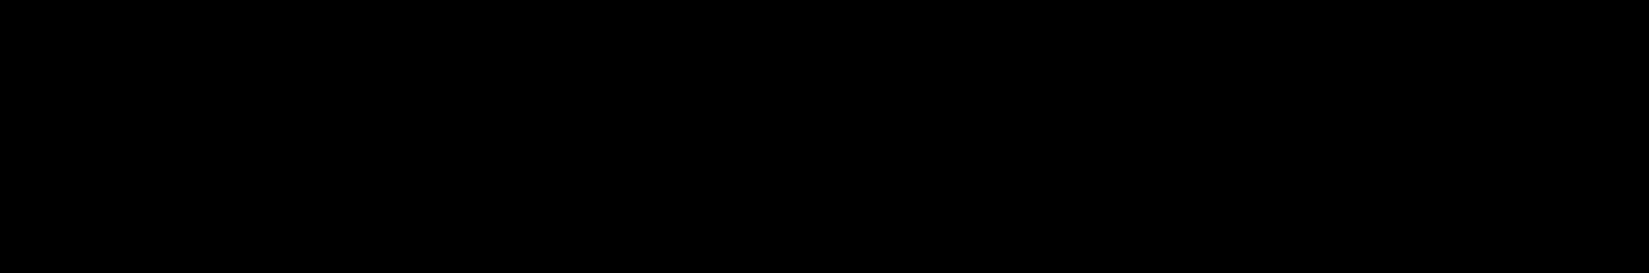 Five polyhedra labeled A--E.